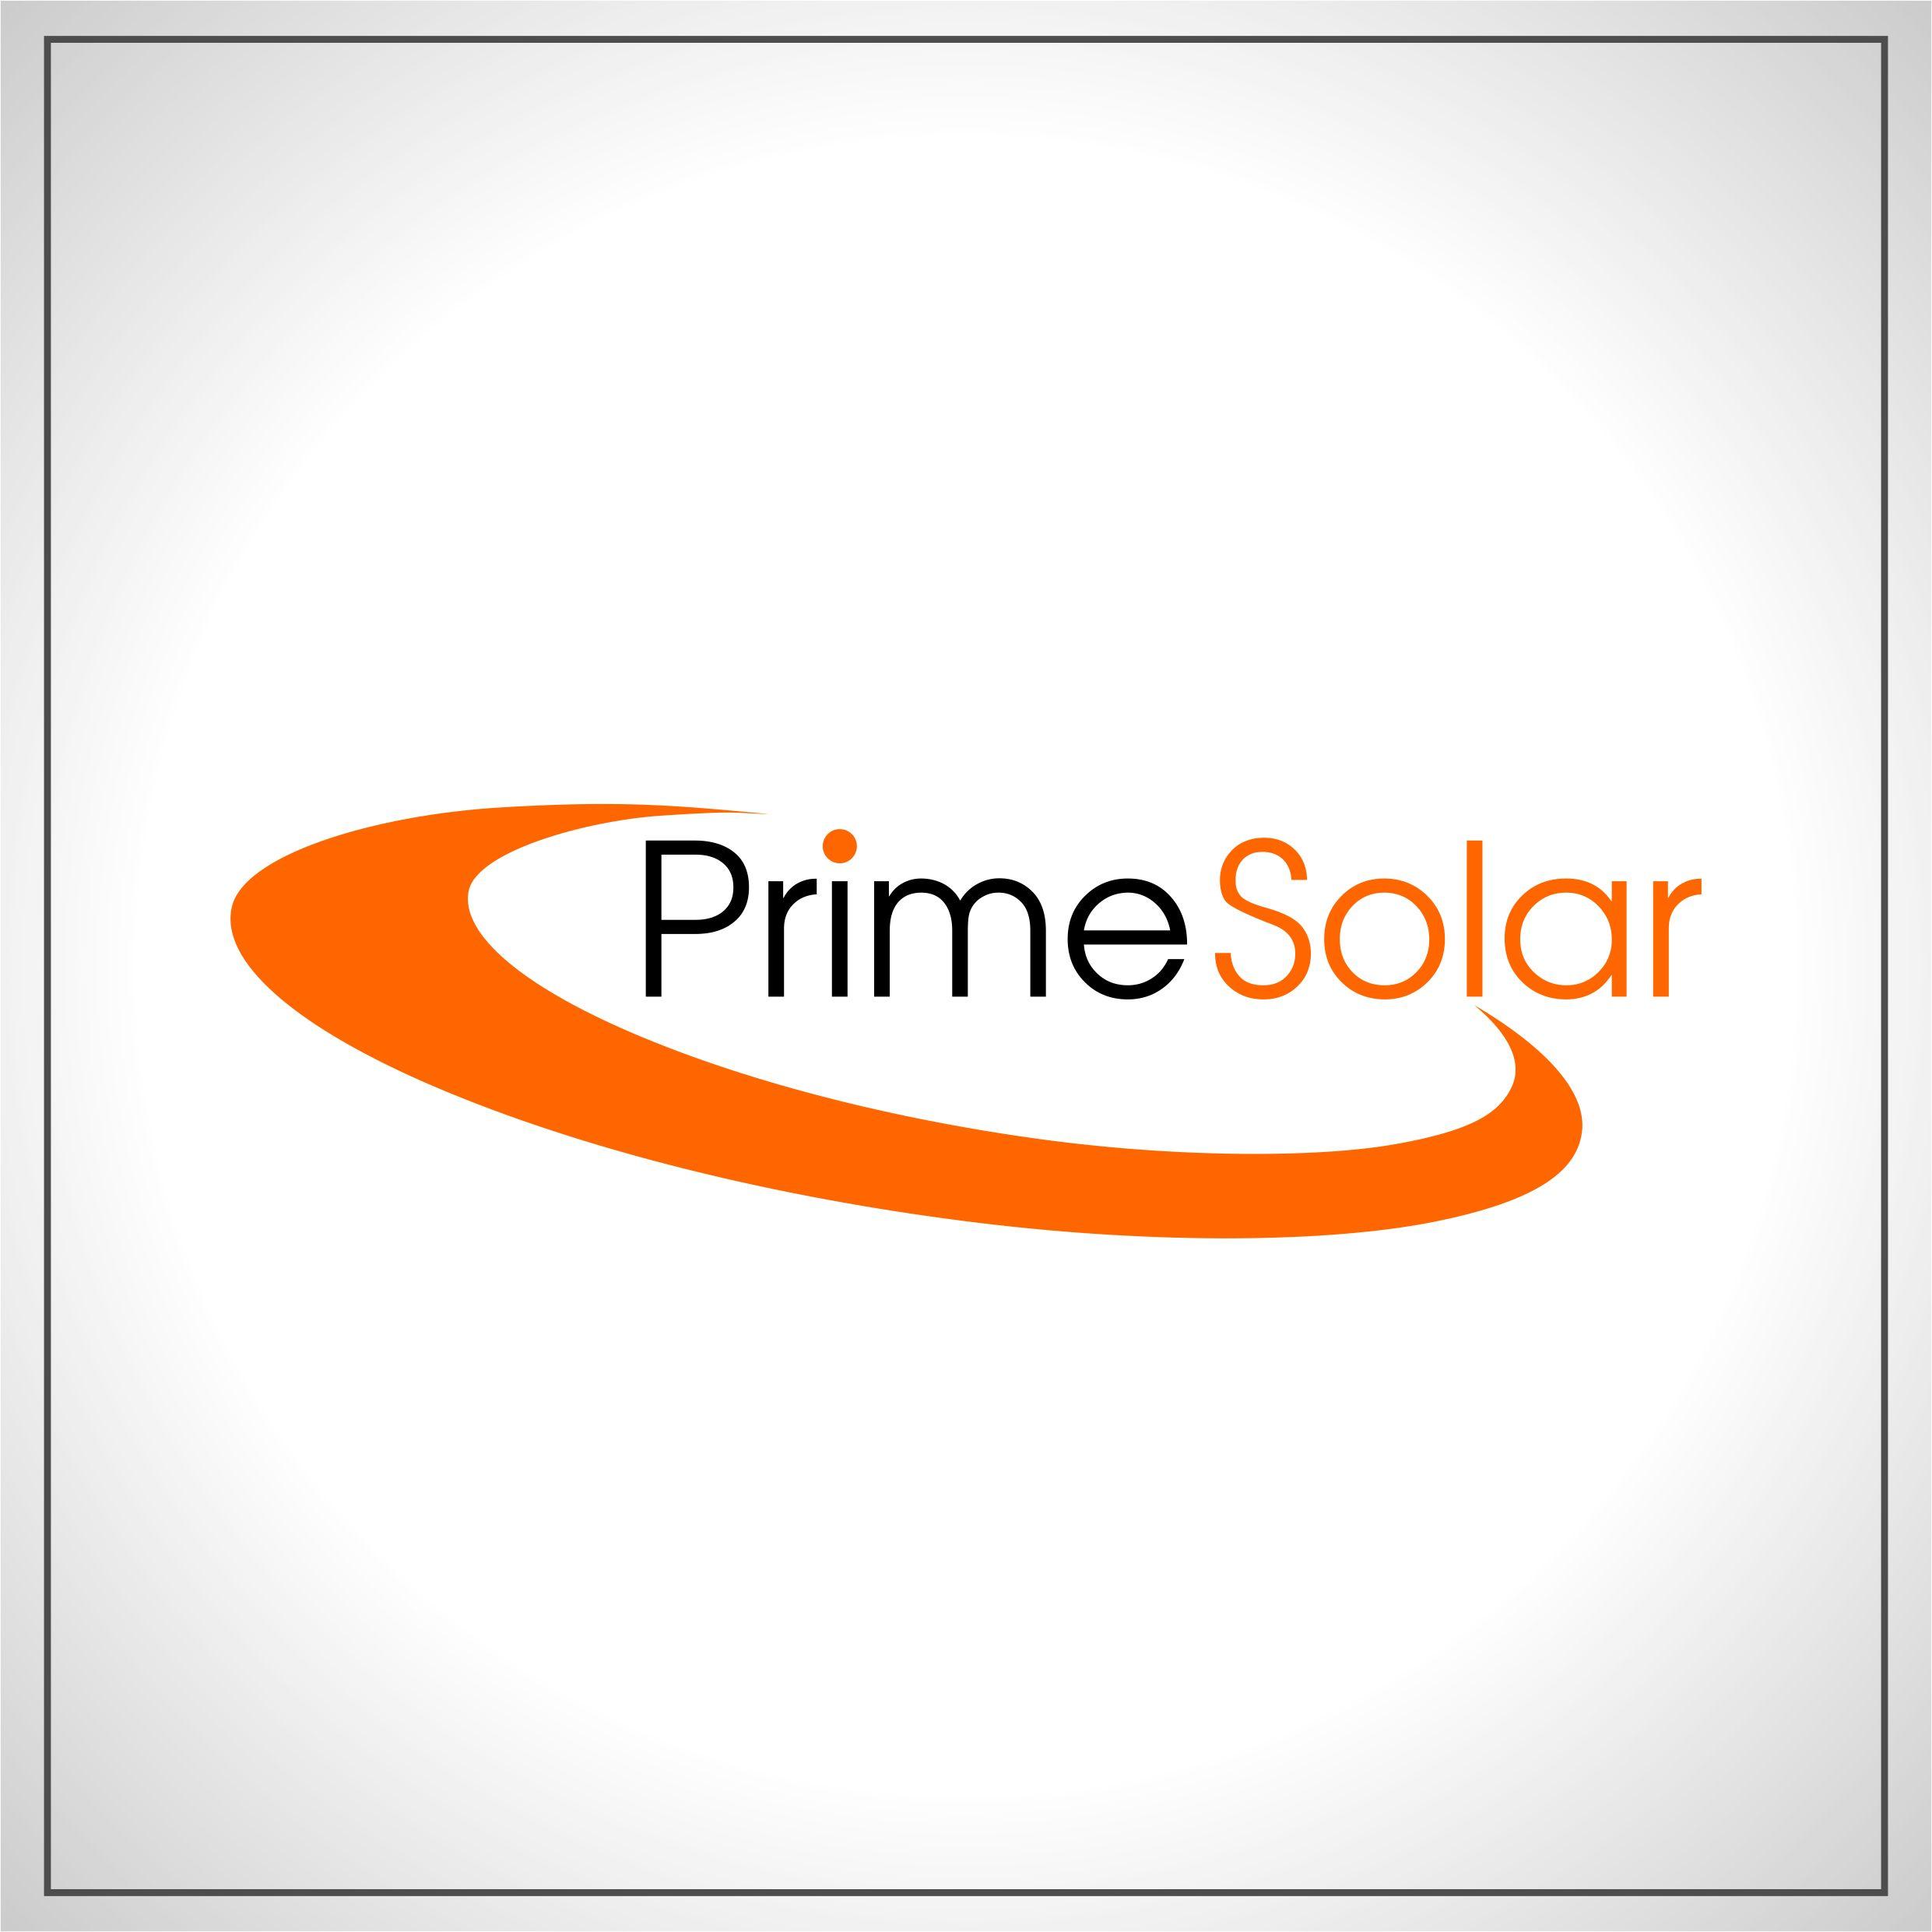 Логотип компании PrimeSolar [UPD: 16:45 15/12/11] фото f_4eef185b4e031.jpg